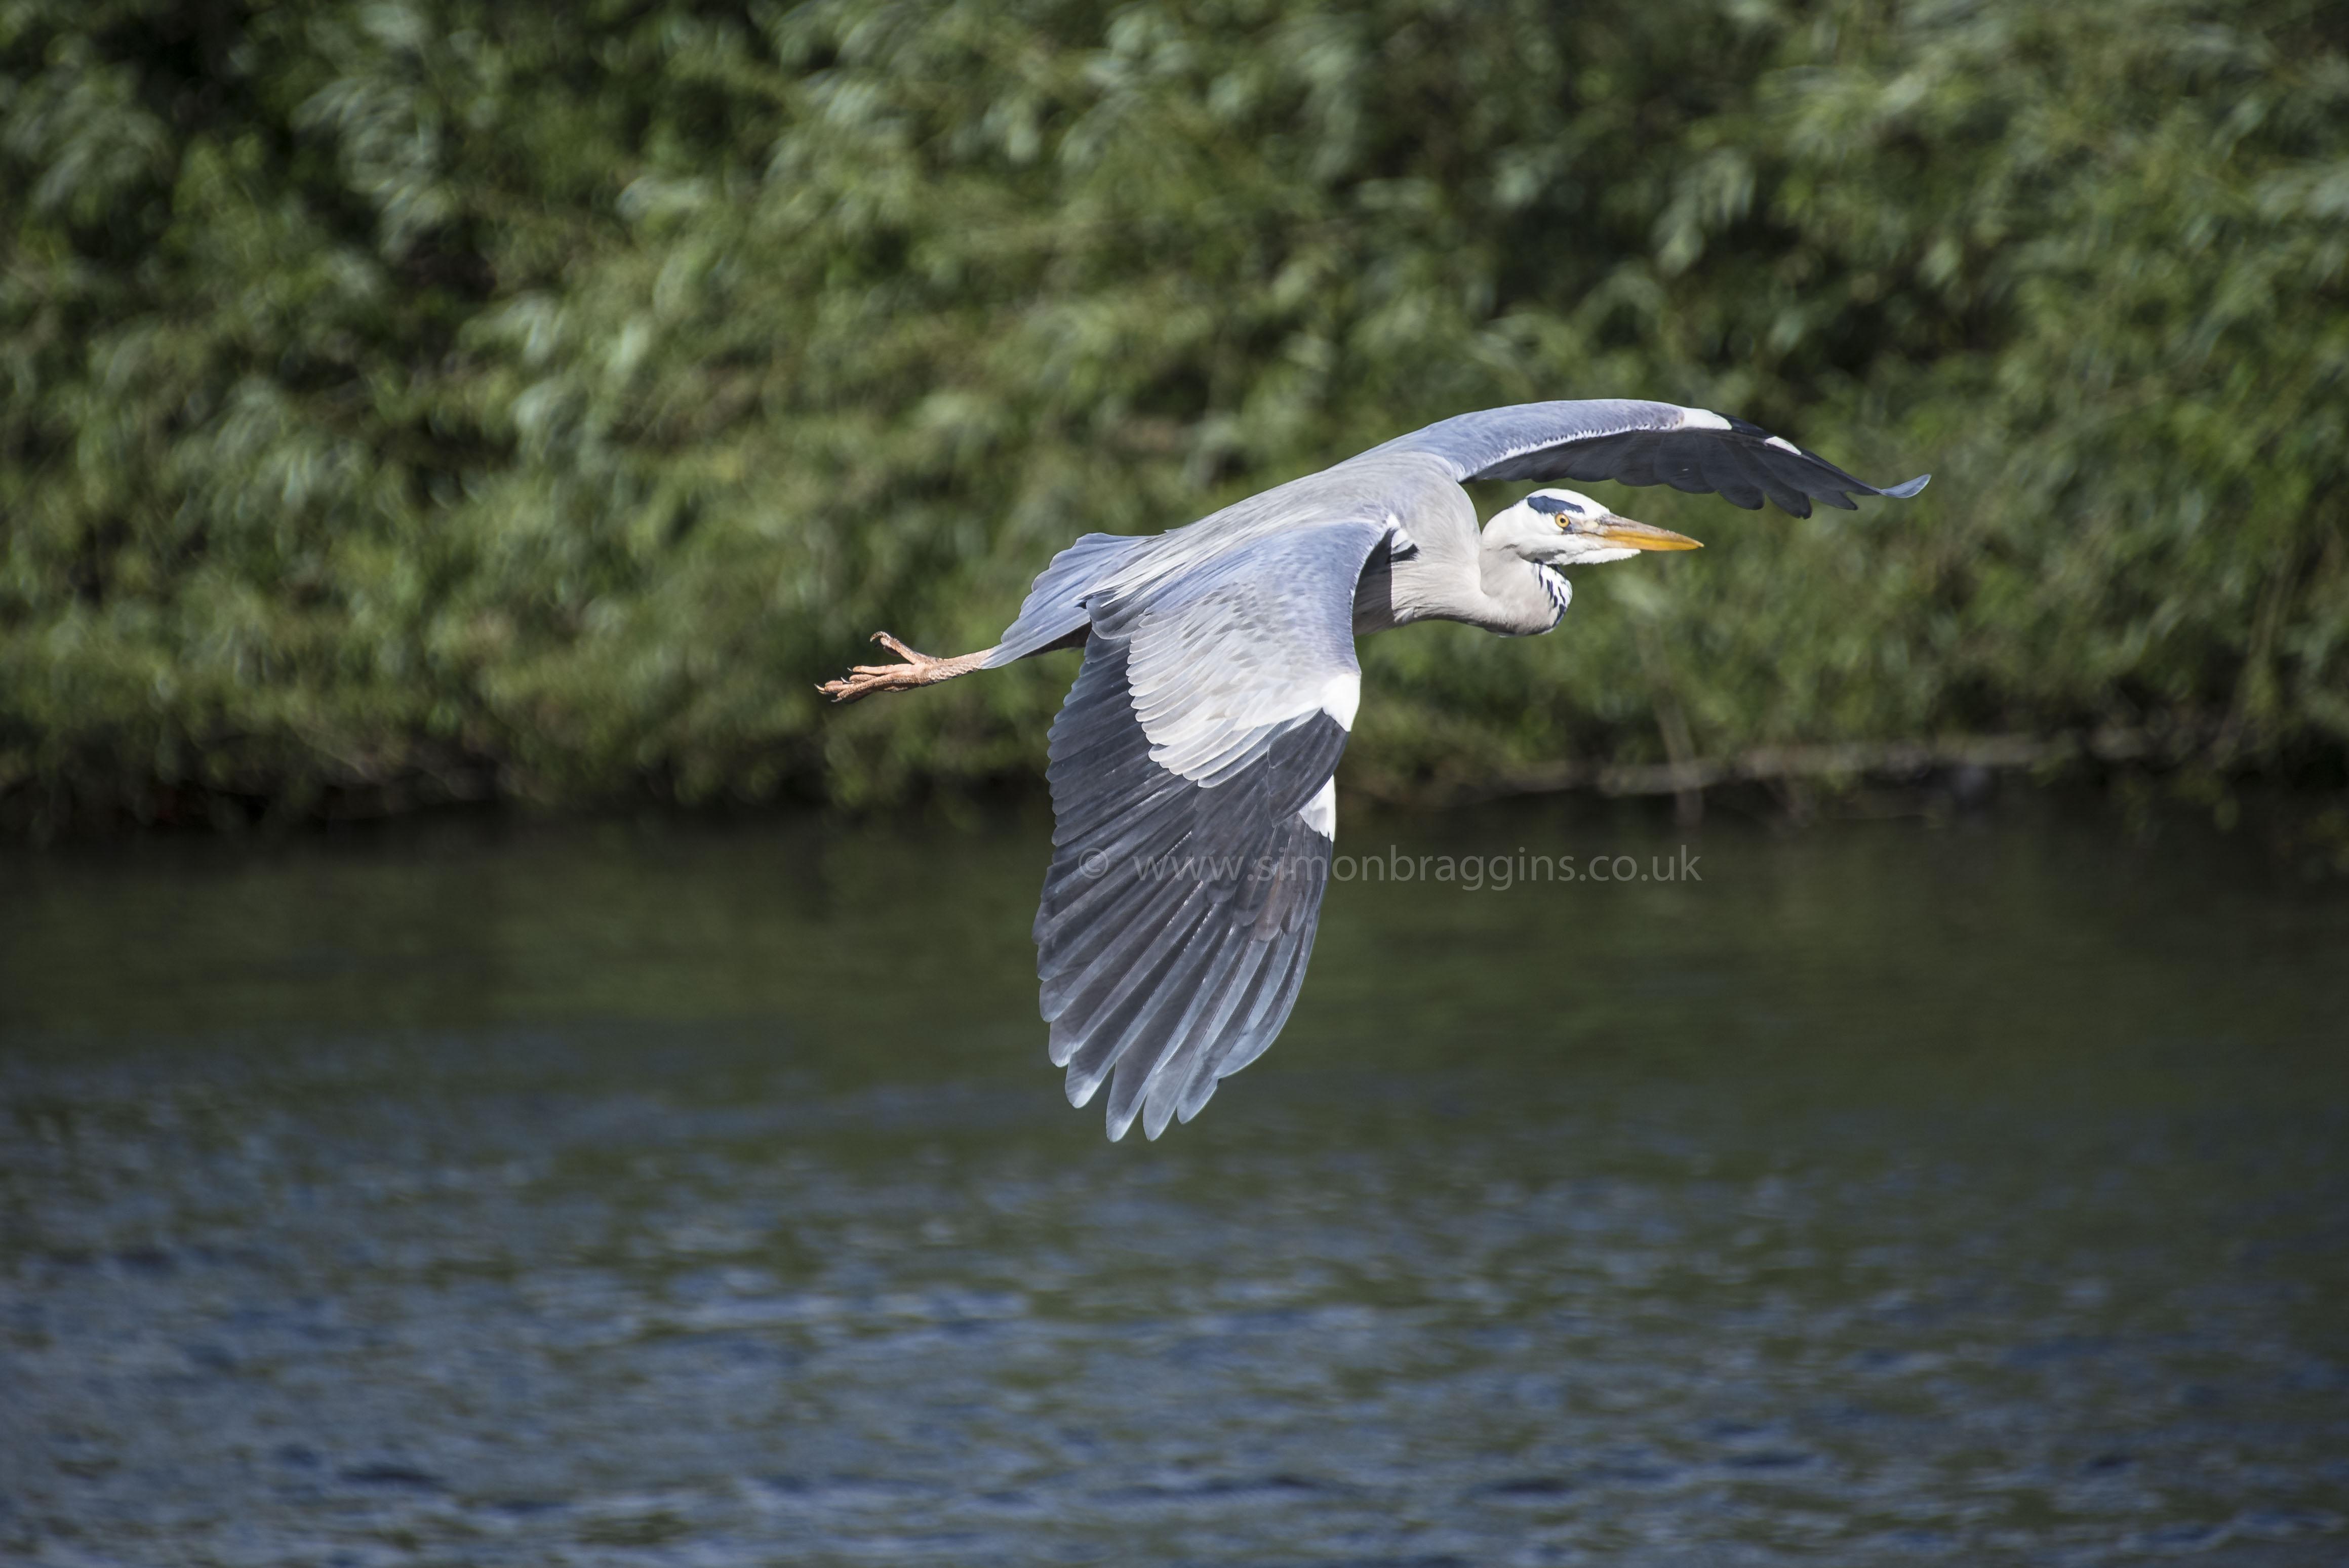 Glider: Harry in full flight along the river Lea - Tottenham Hale, June 2017